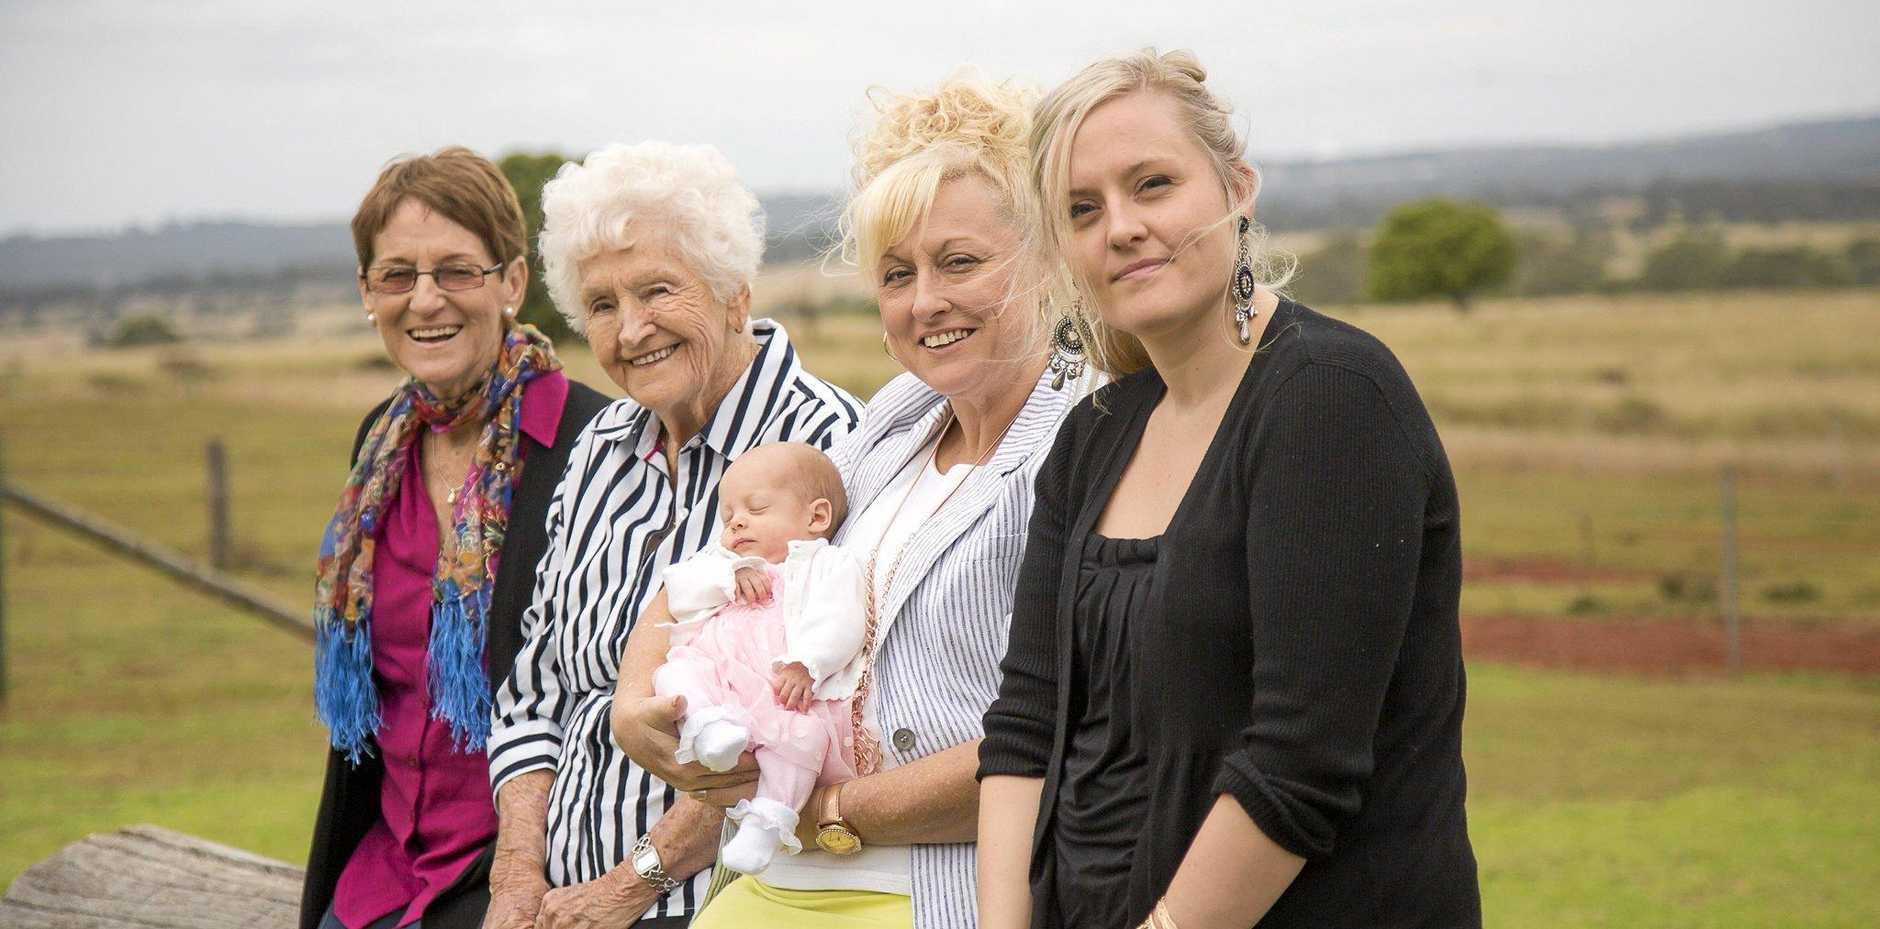 FIVE GENERATIONS: Maureen Jones (formerly from Maryborough), birthday girl Dorothy Schmidt, Donna Freyling (Kingaroy), baby Jayne Flynn (Chinchilla) and Kristen Flynn (Chinchilla).